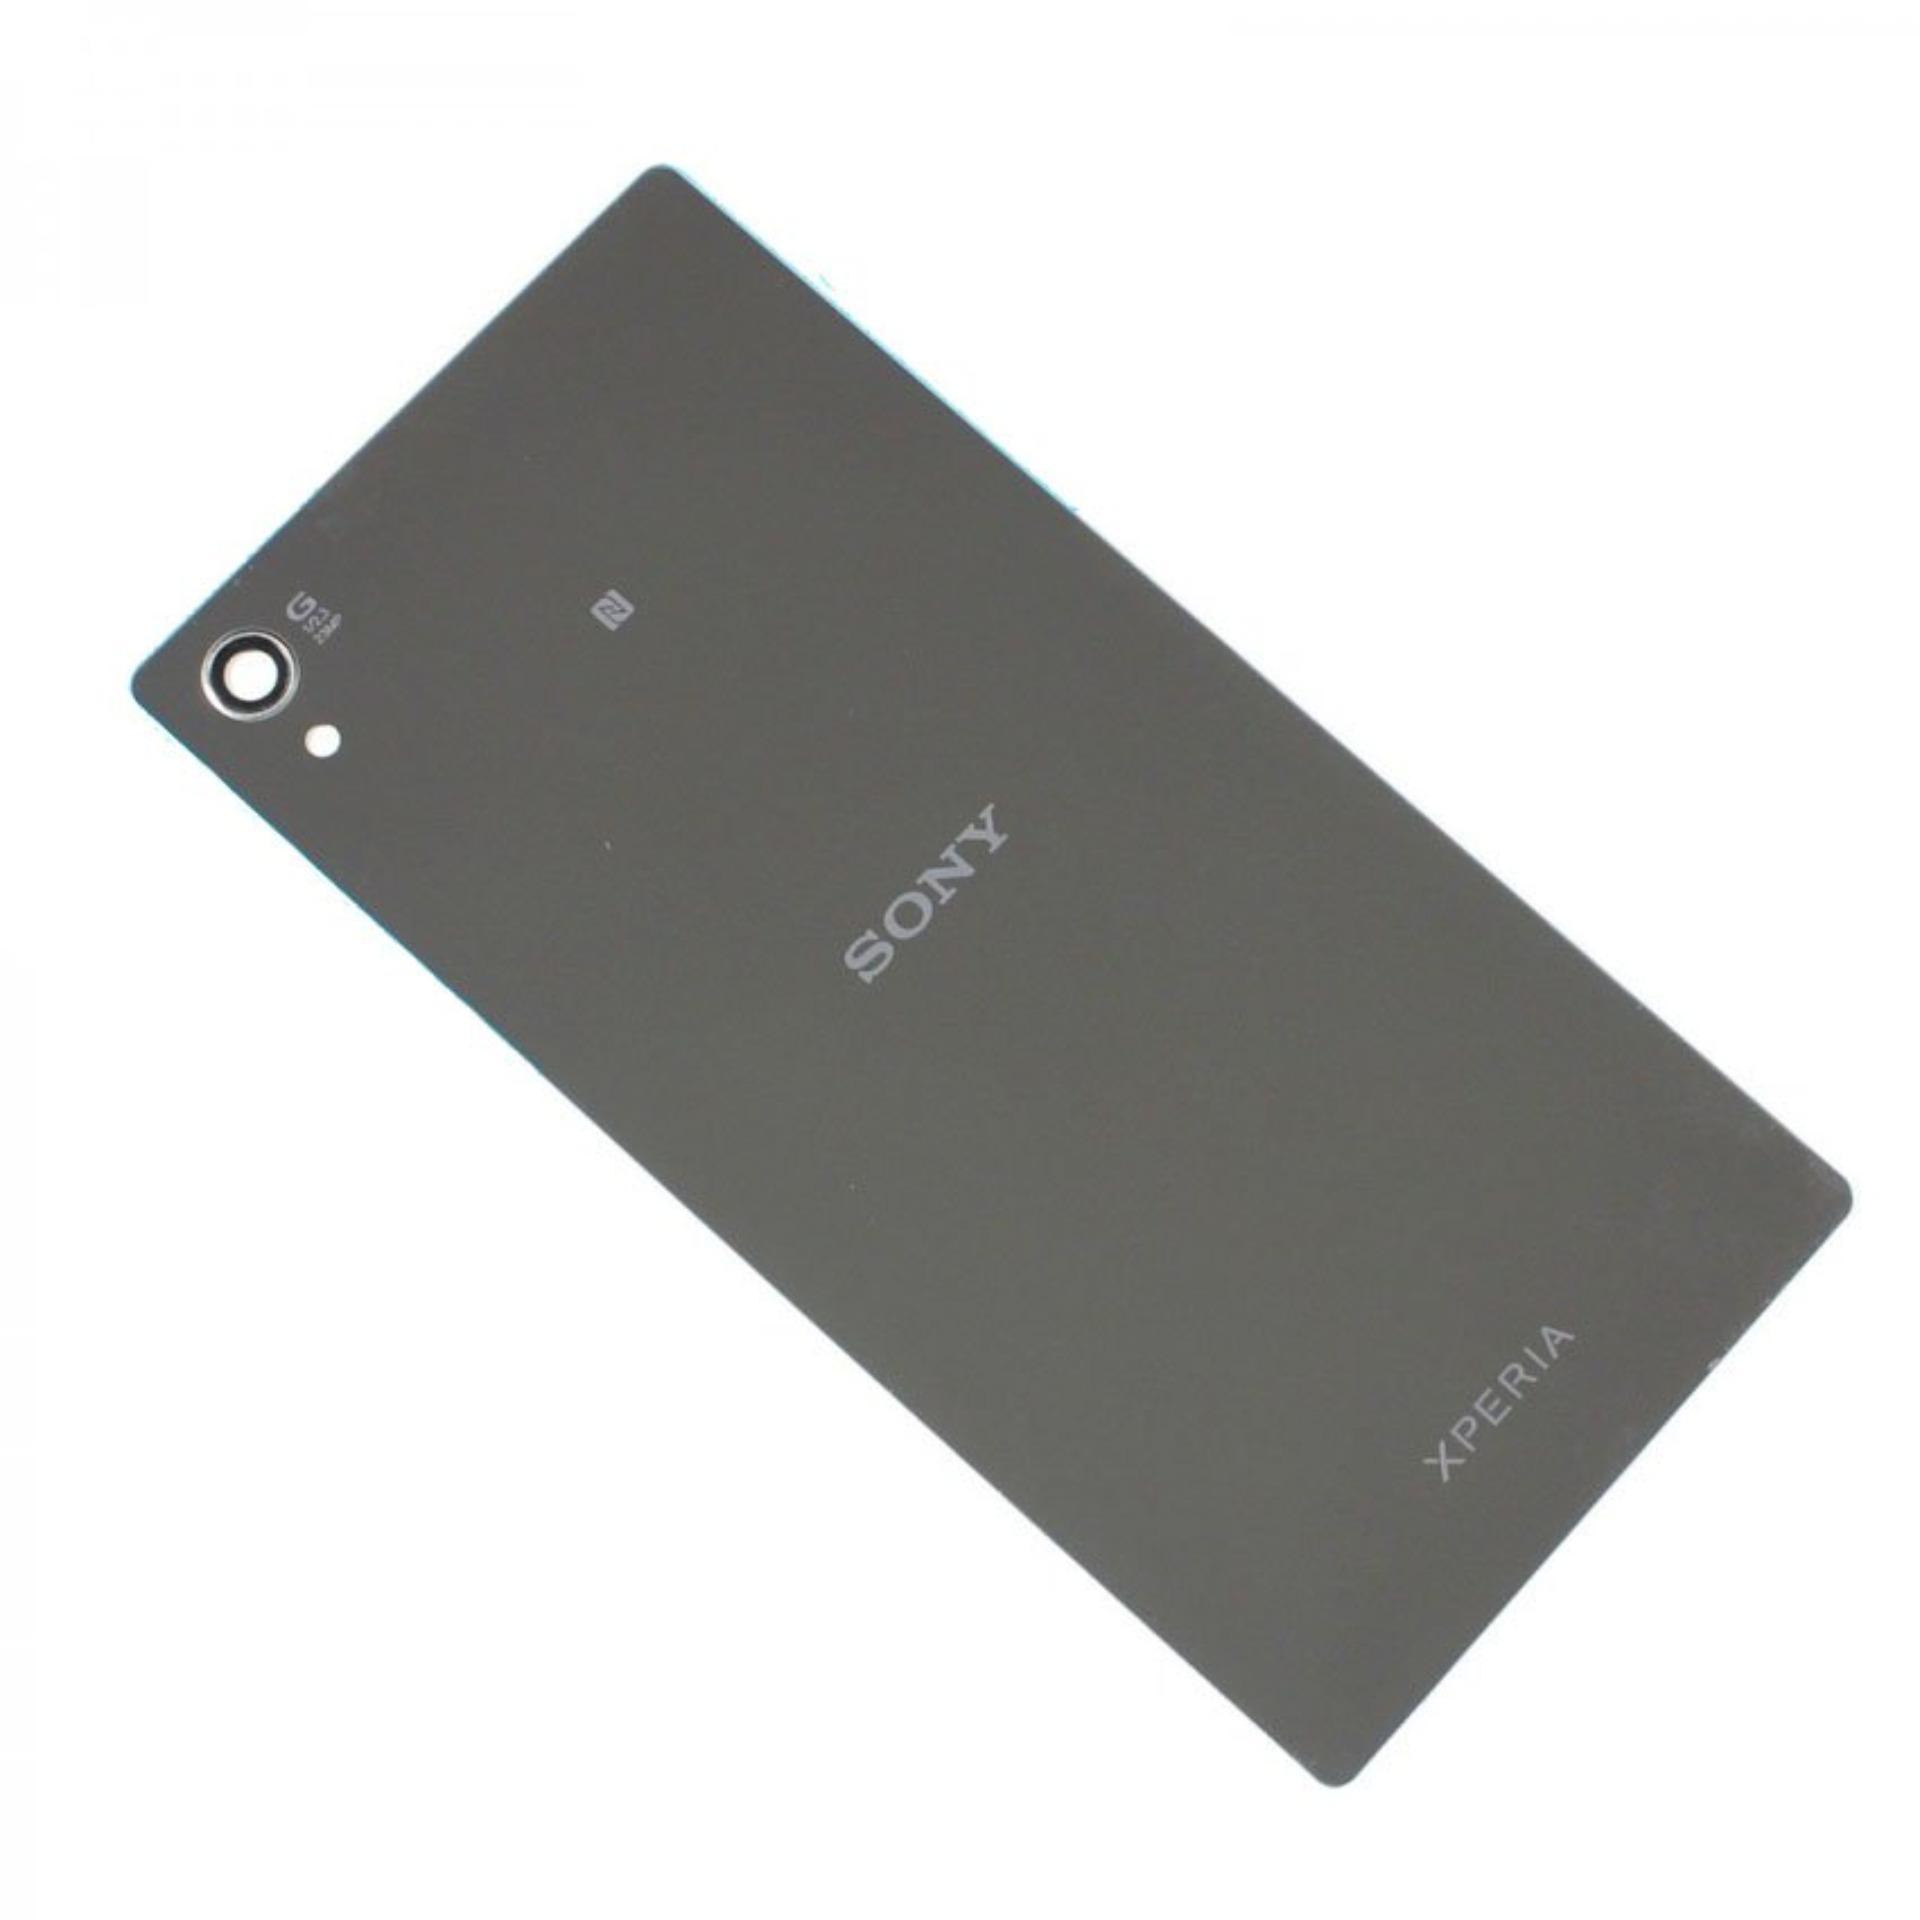 Mr Sony Xperia Z5 Compact Mini Tempered Glass Anti Gores Kaca Z3 Shock Price Premium E6853 55 Inch Back Cover Case Penutup